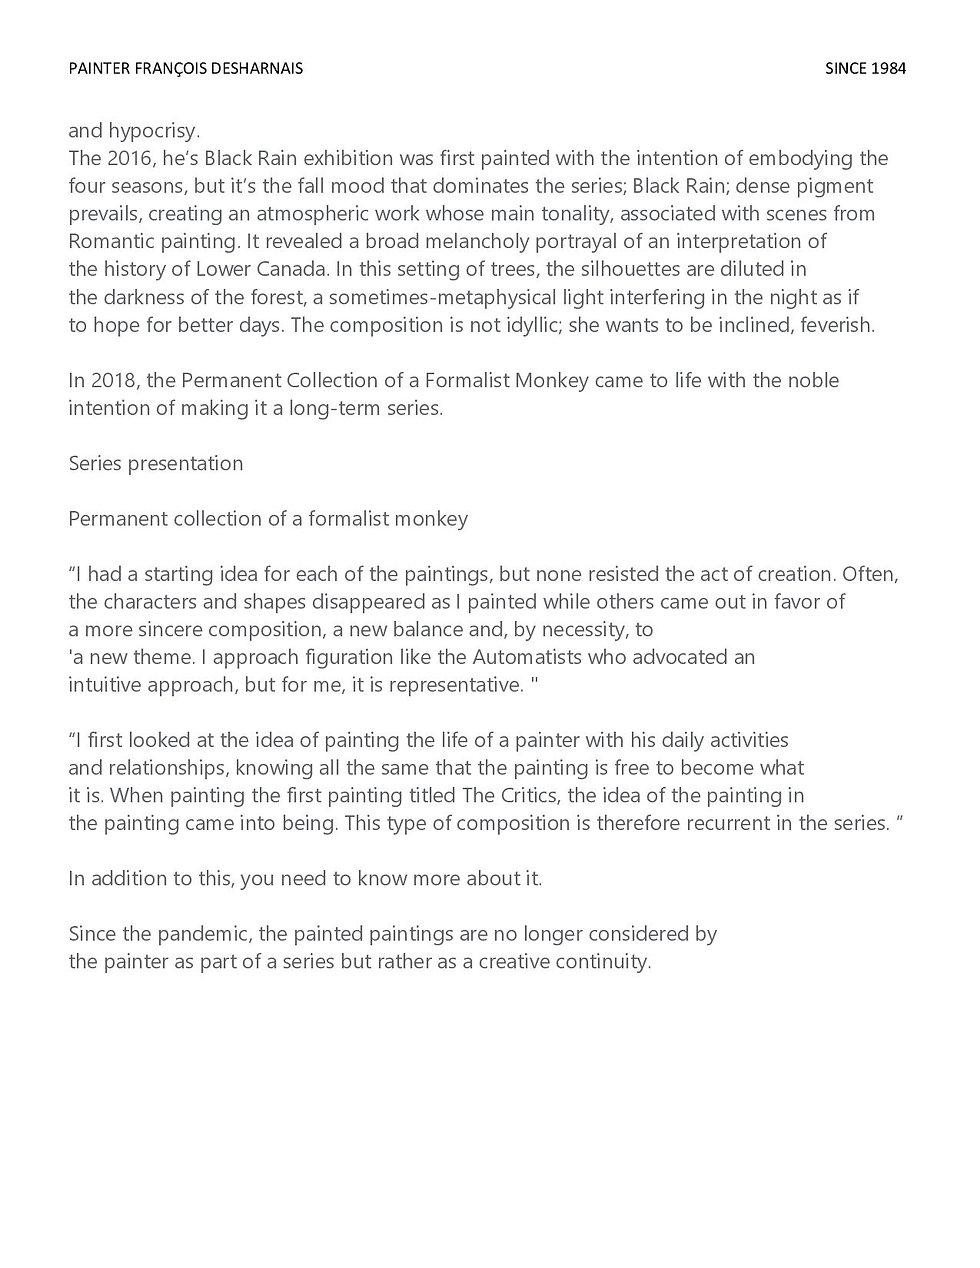 Biography-page-002.jpg